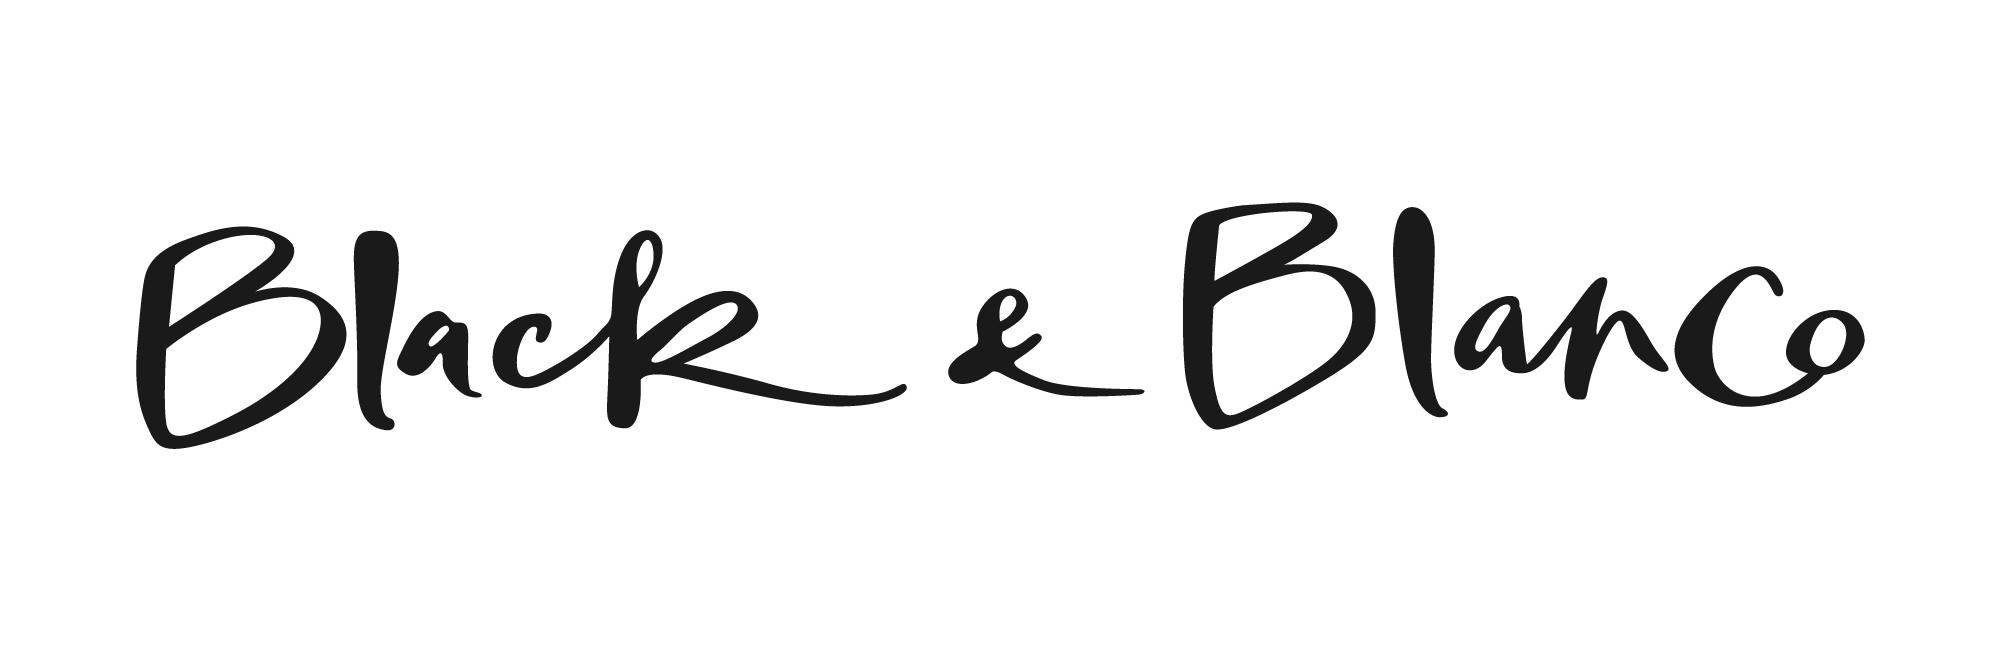 Black and Blanco